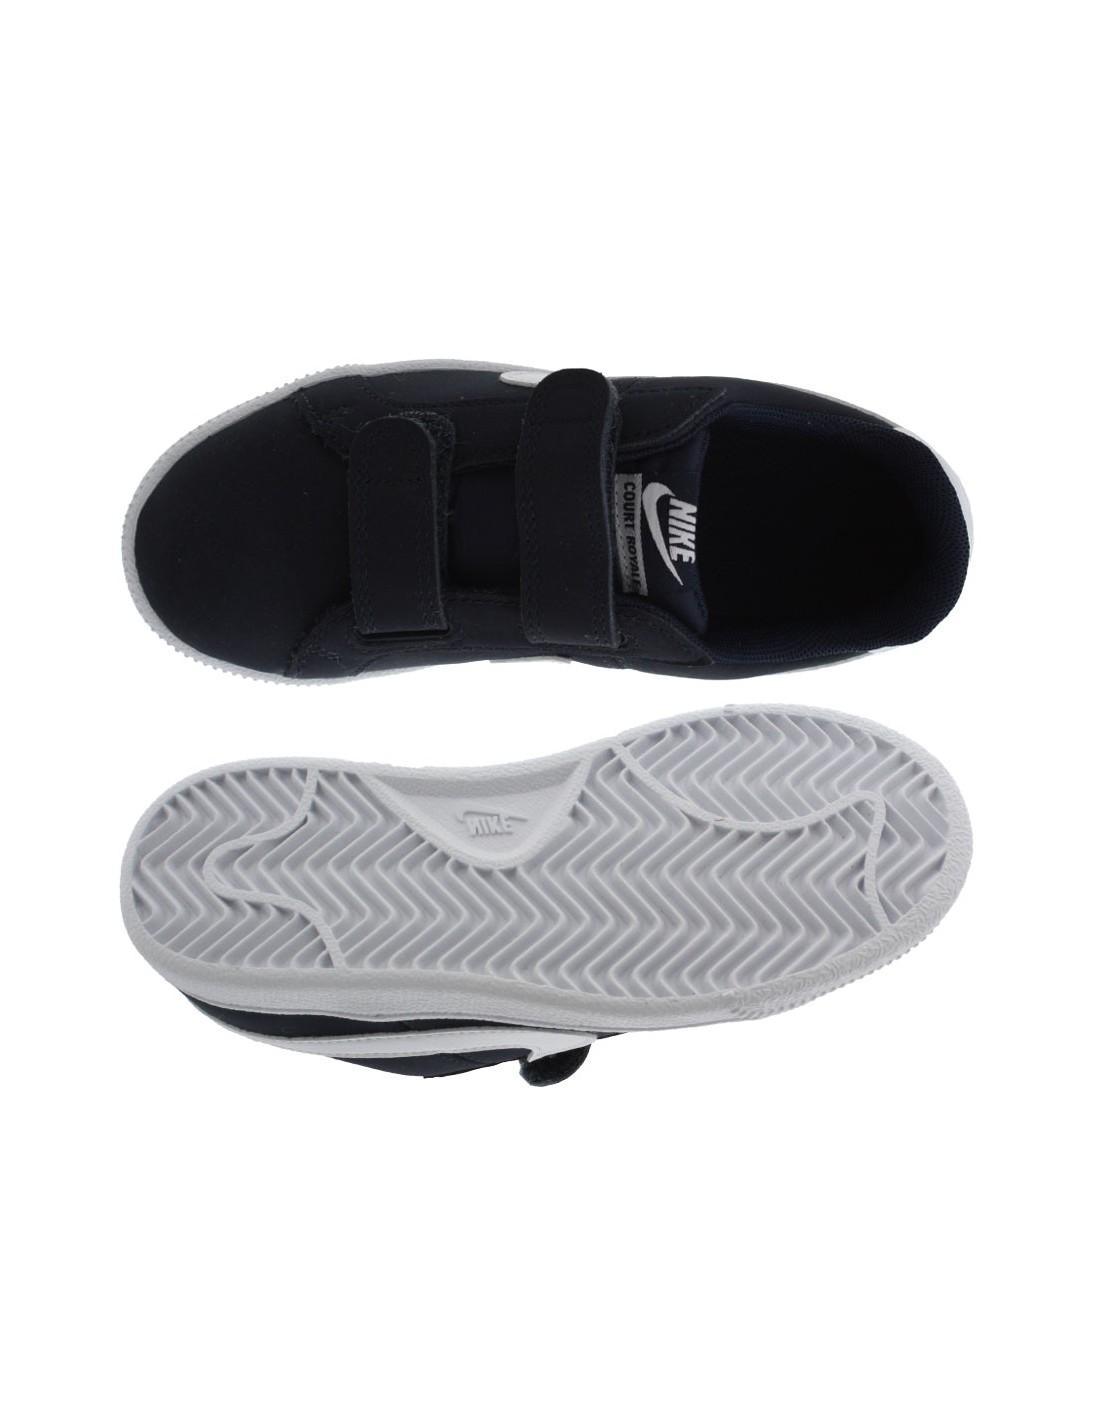 Blu Bambino Royale Nike Court Scarpe lF1cTKJ